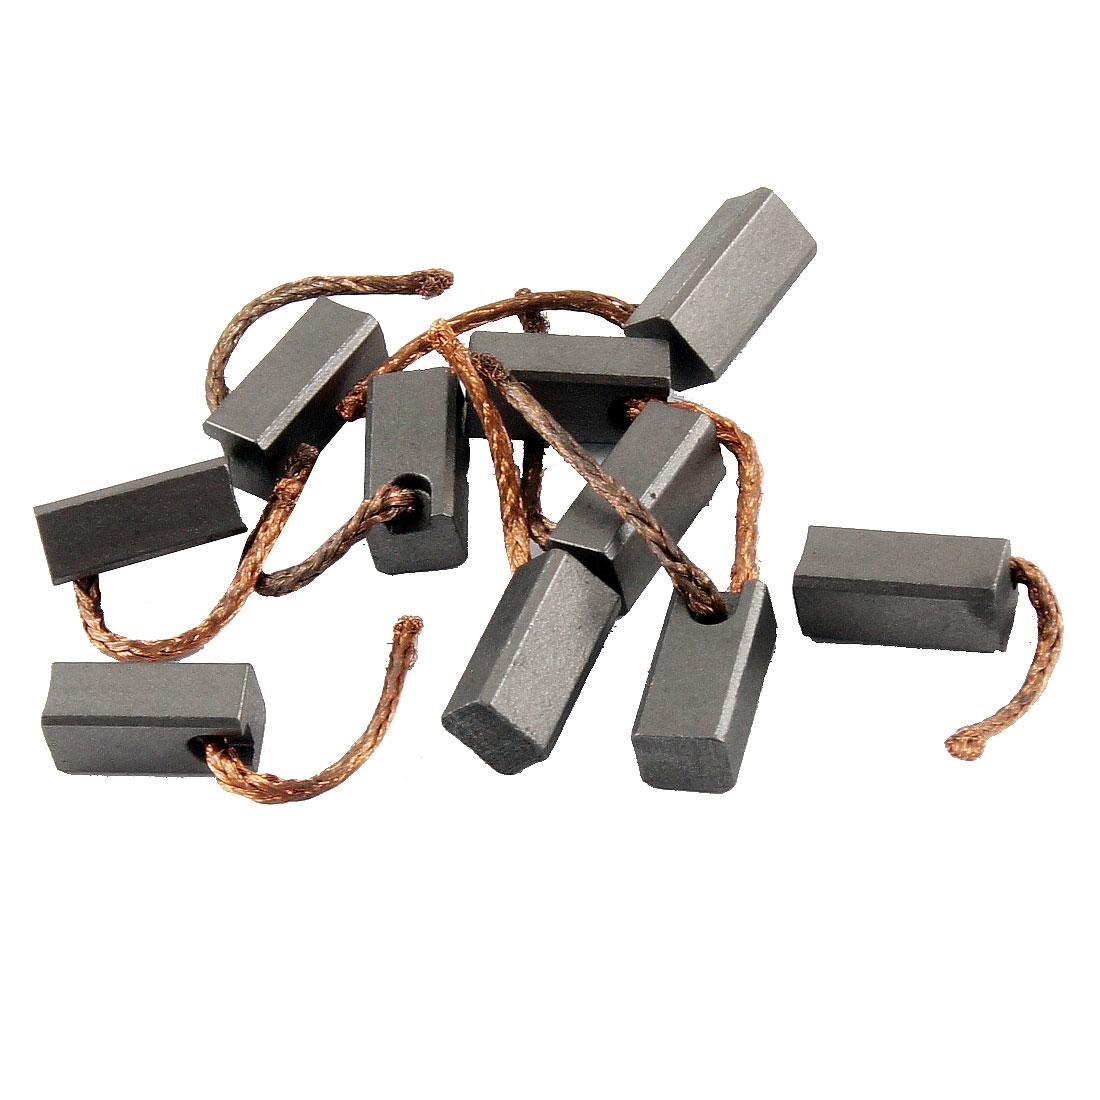 "Repair Parts 17/32"" x 7/32"" x 6/32"" DC Electric Motor Carbon Brush 10 Pcs"